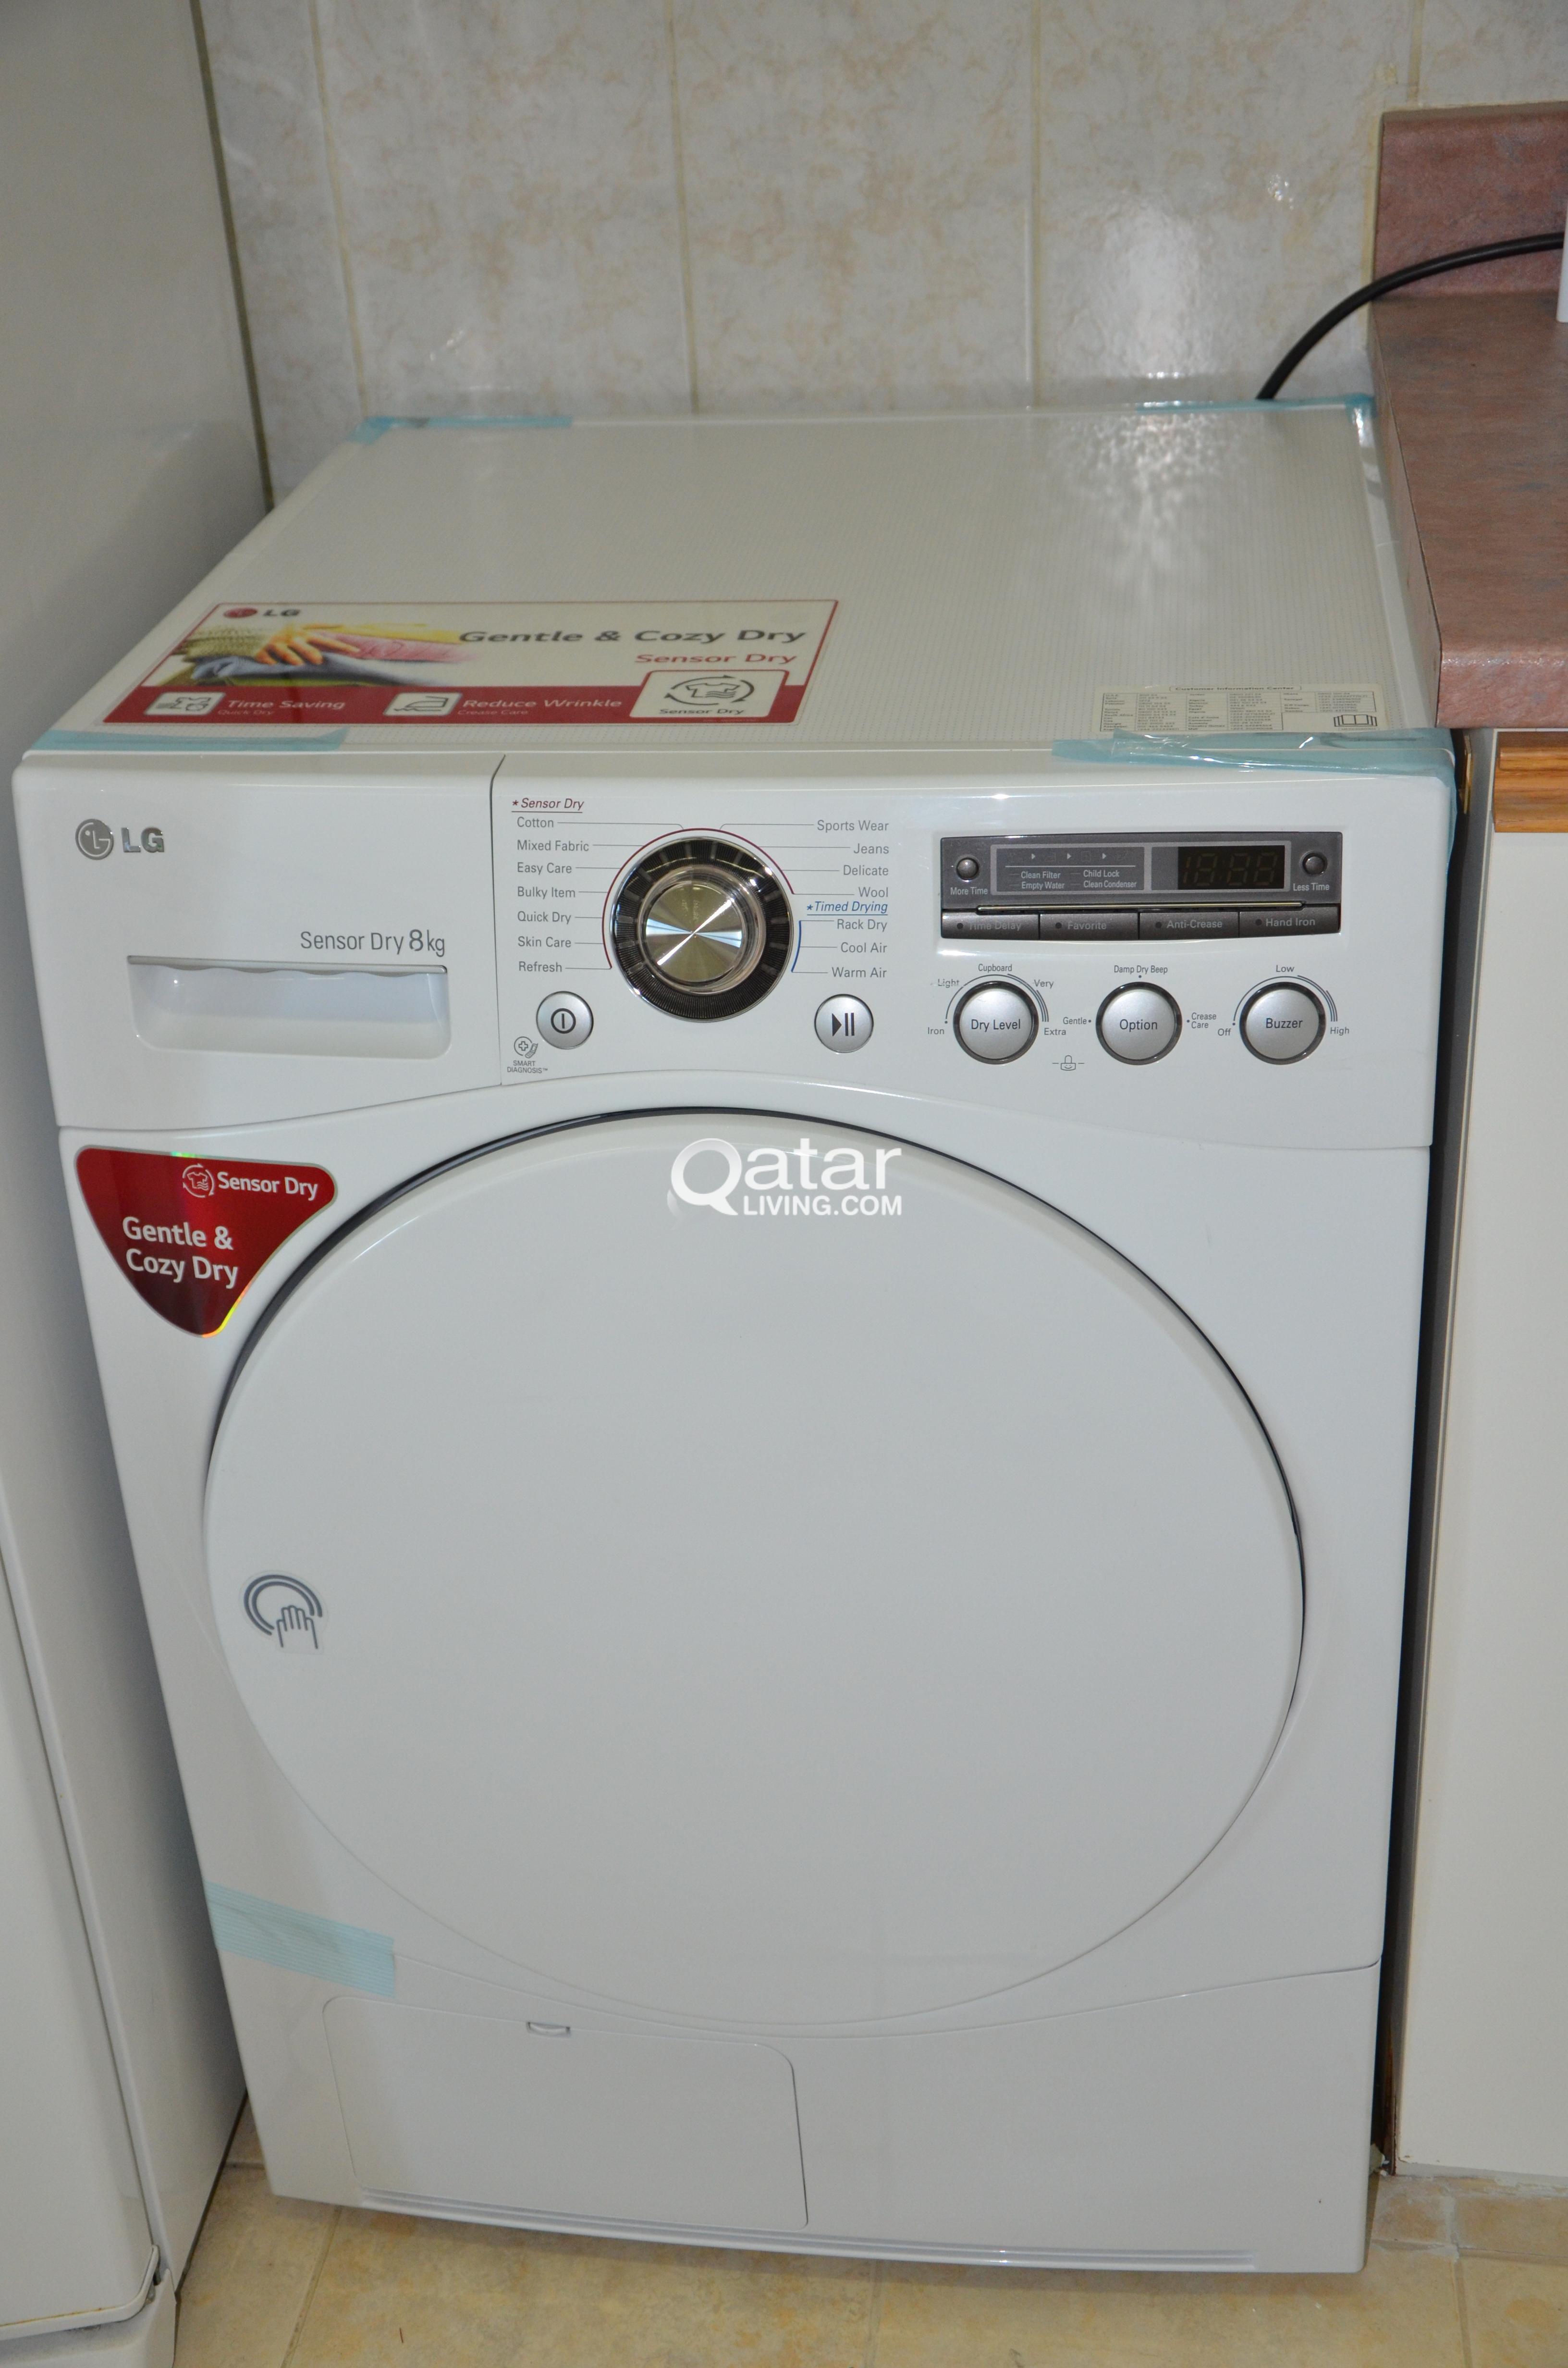 LG Dryer - Sensor dry 8 Kg capacity | Qatar Living